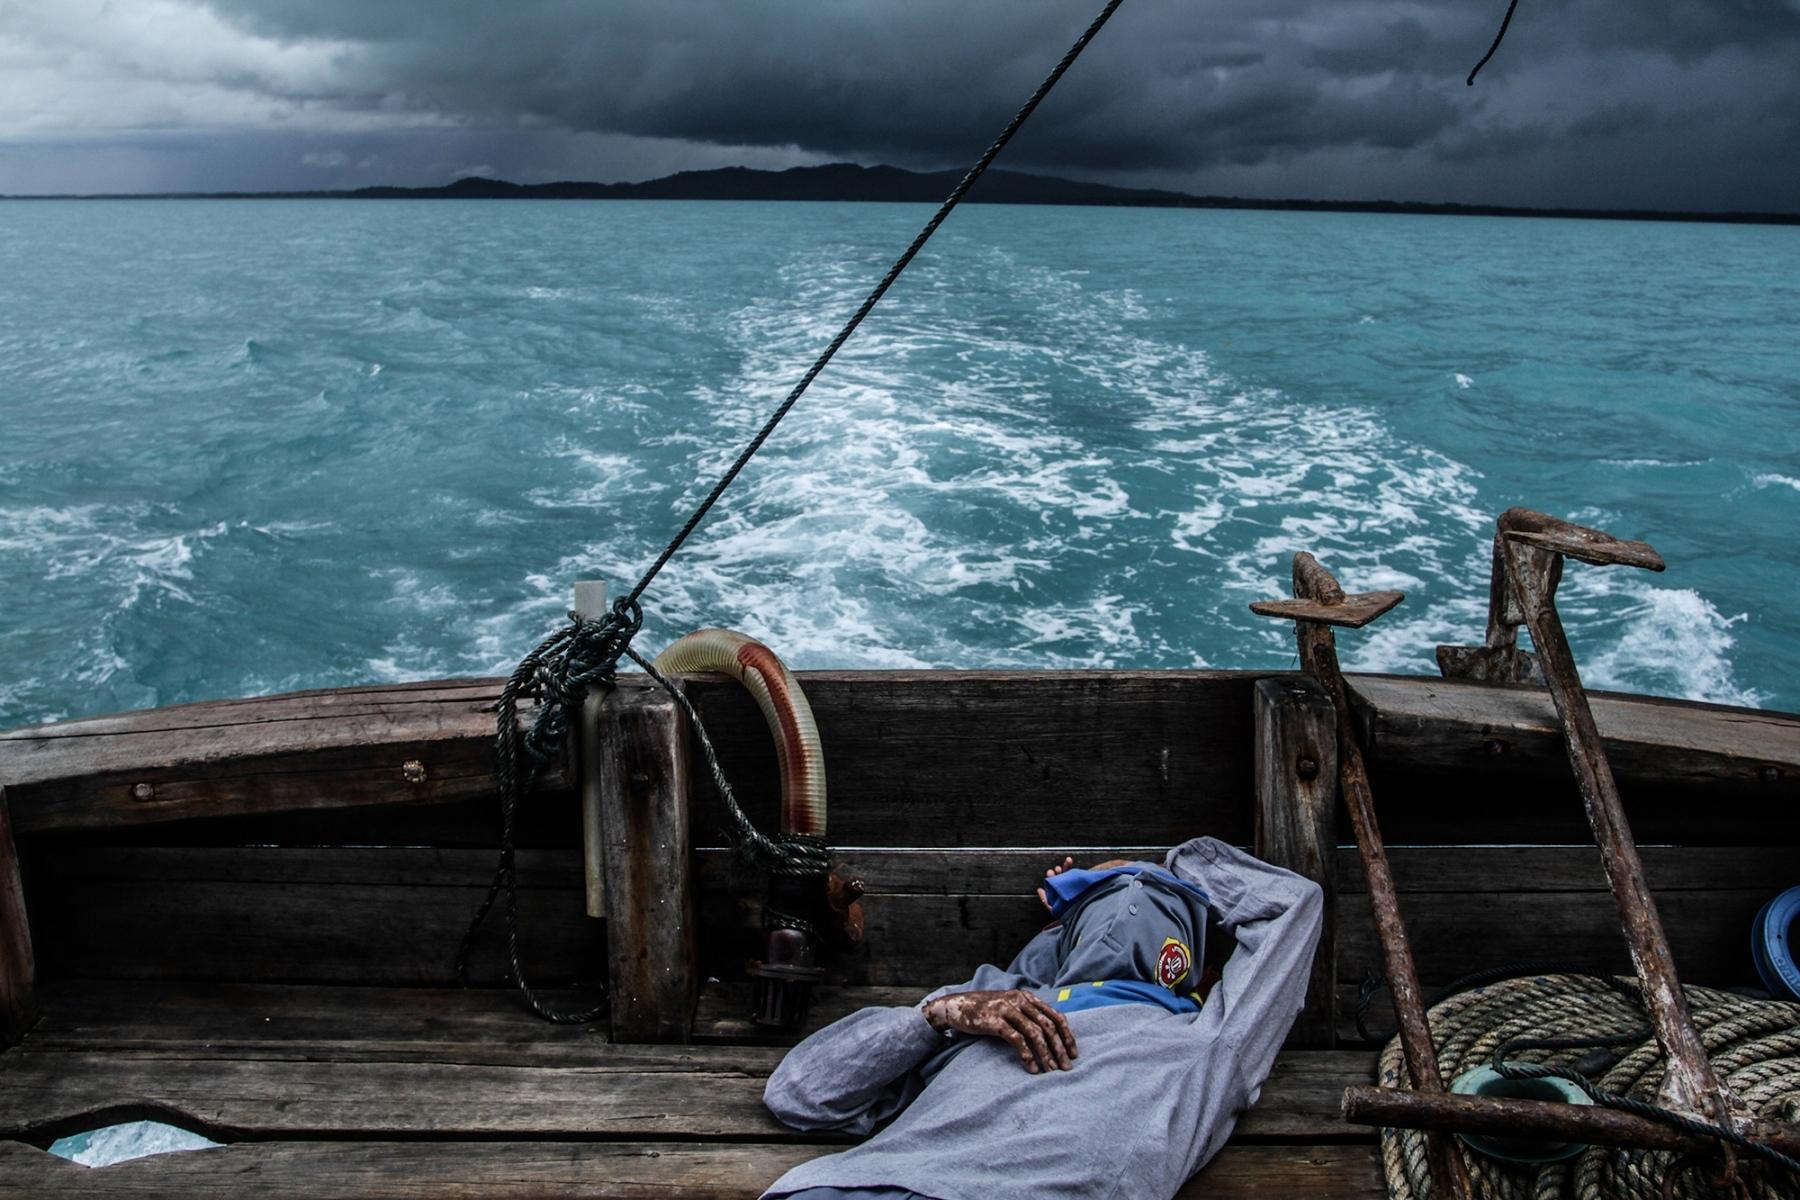 Seorang nelayan tertidur di atas kapal yang harus pergi lebih jauh lagi ketengah laut, karena dipinggiran pantai sudah terdapat aktivitas penambangan timah di sekitar laut  Desa Batu Belubang, Kecamatan Pangkalanbaru, Kabupaten Bangka Tengah, [13/08/2020]. Sekali melaut, para nelayan harus menempuh jarak sekitar 20 mil atau dalam jangka waktu, dua hingga tiga jam.